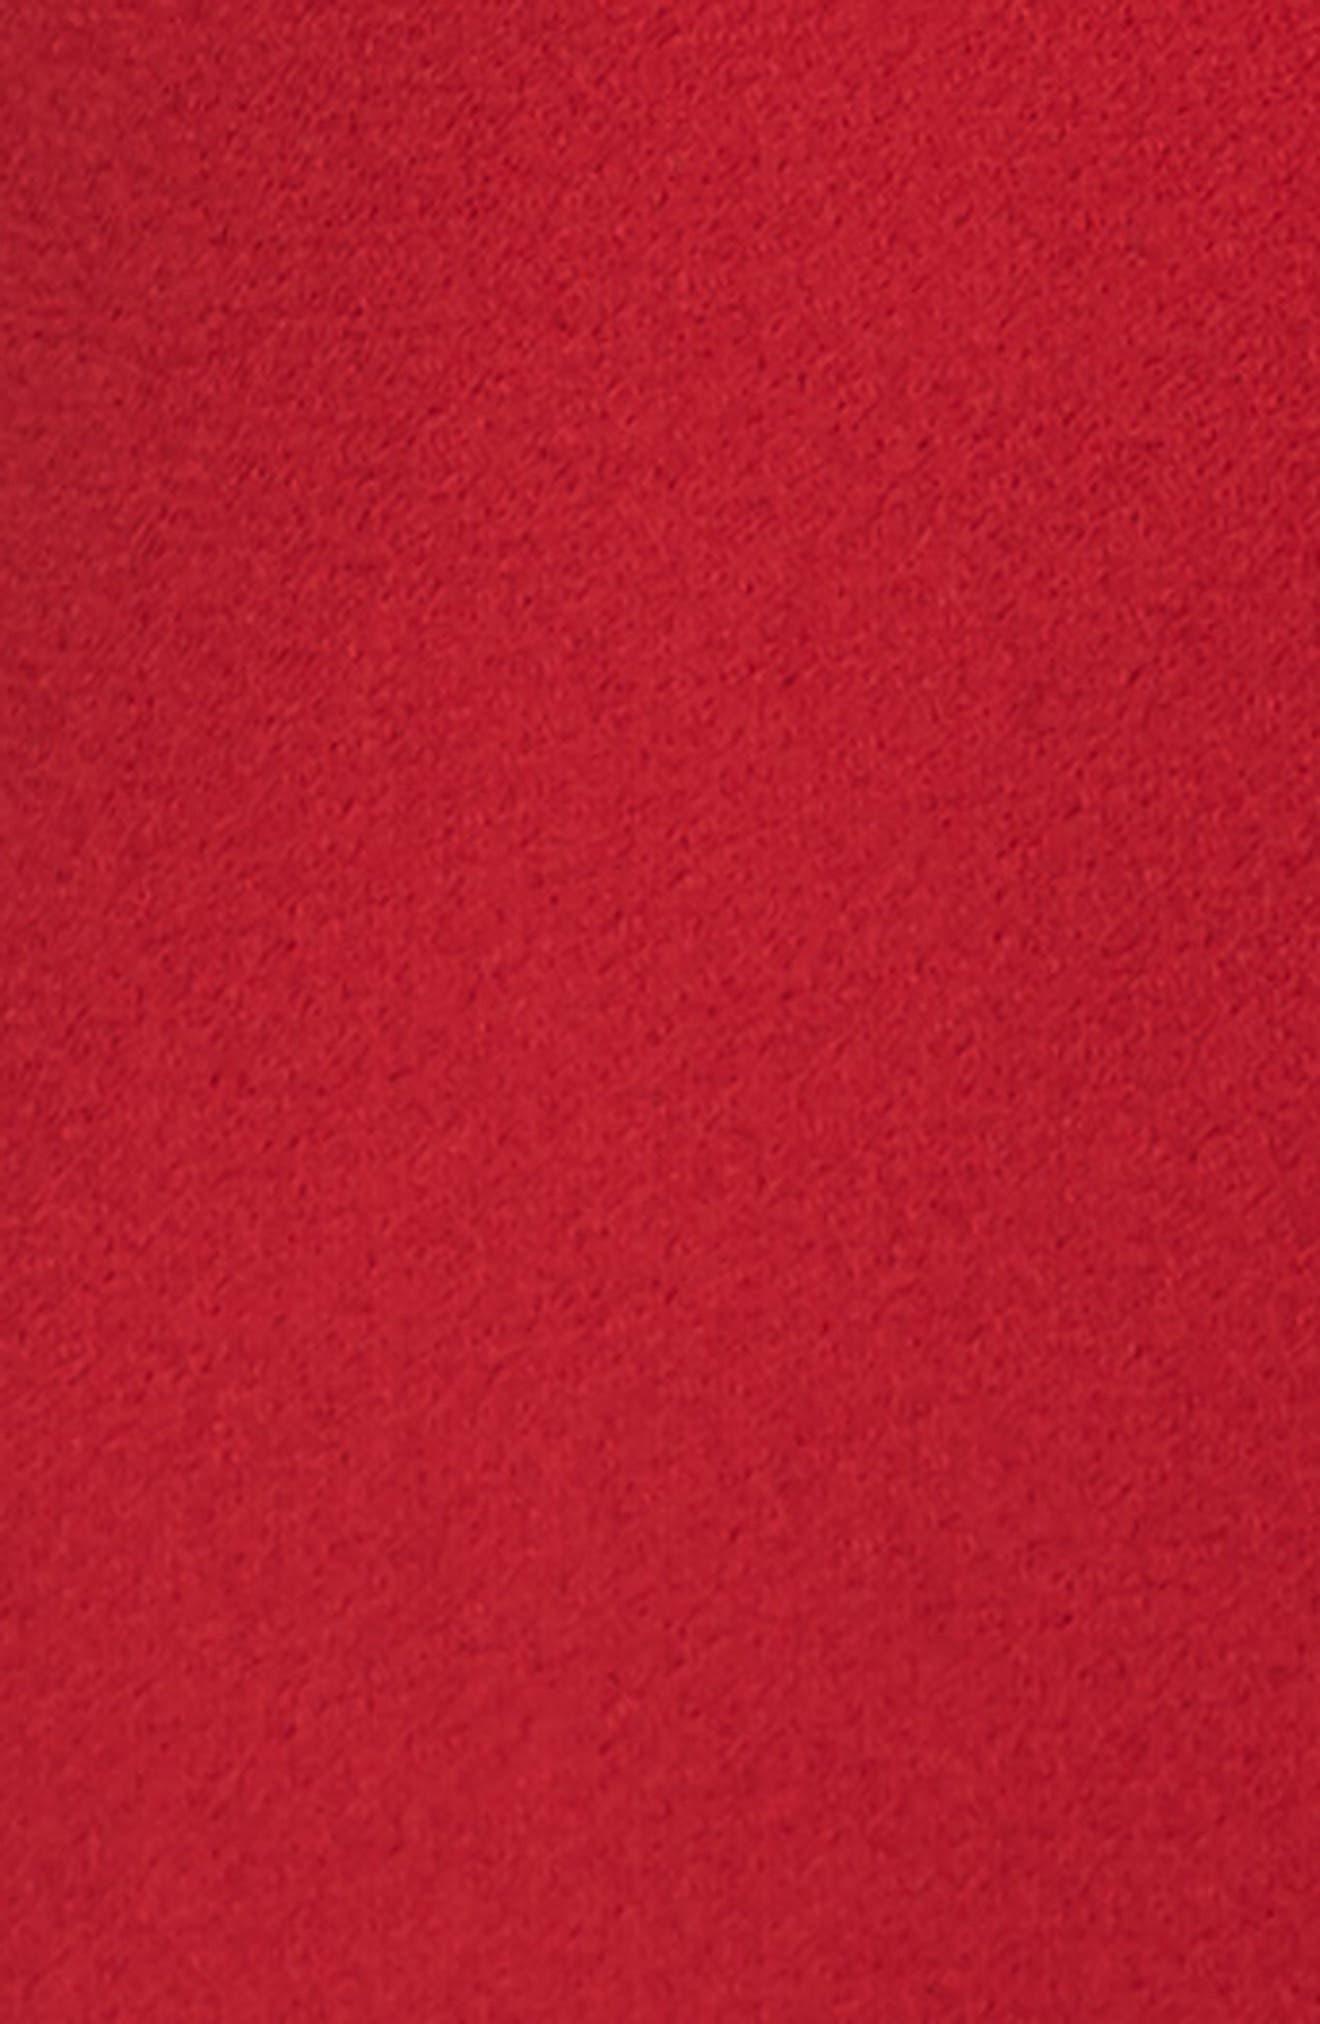 Ruffle Choker Tank,                             Alternate thumbnail 5, color,                             Red Jester